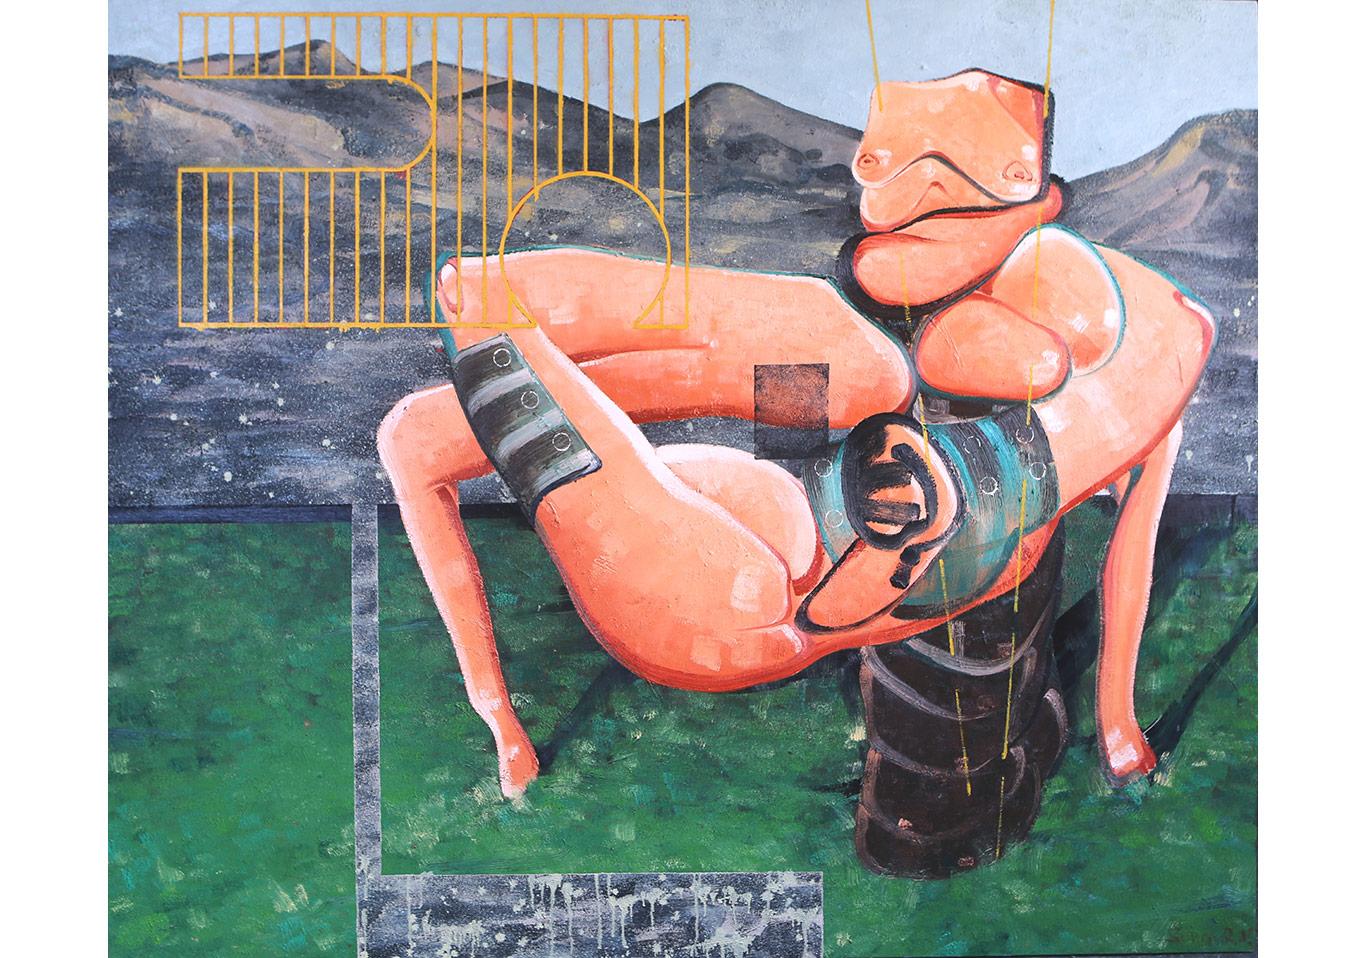 Organik Makine - 167x200 cm - TÜYB - 2015